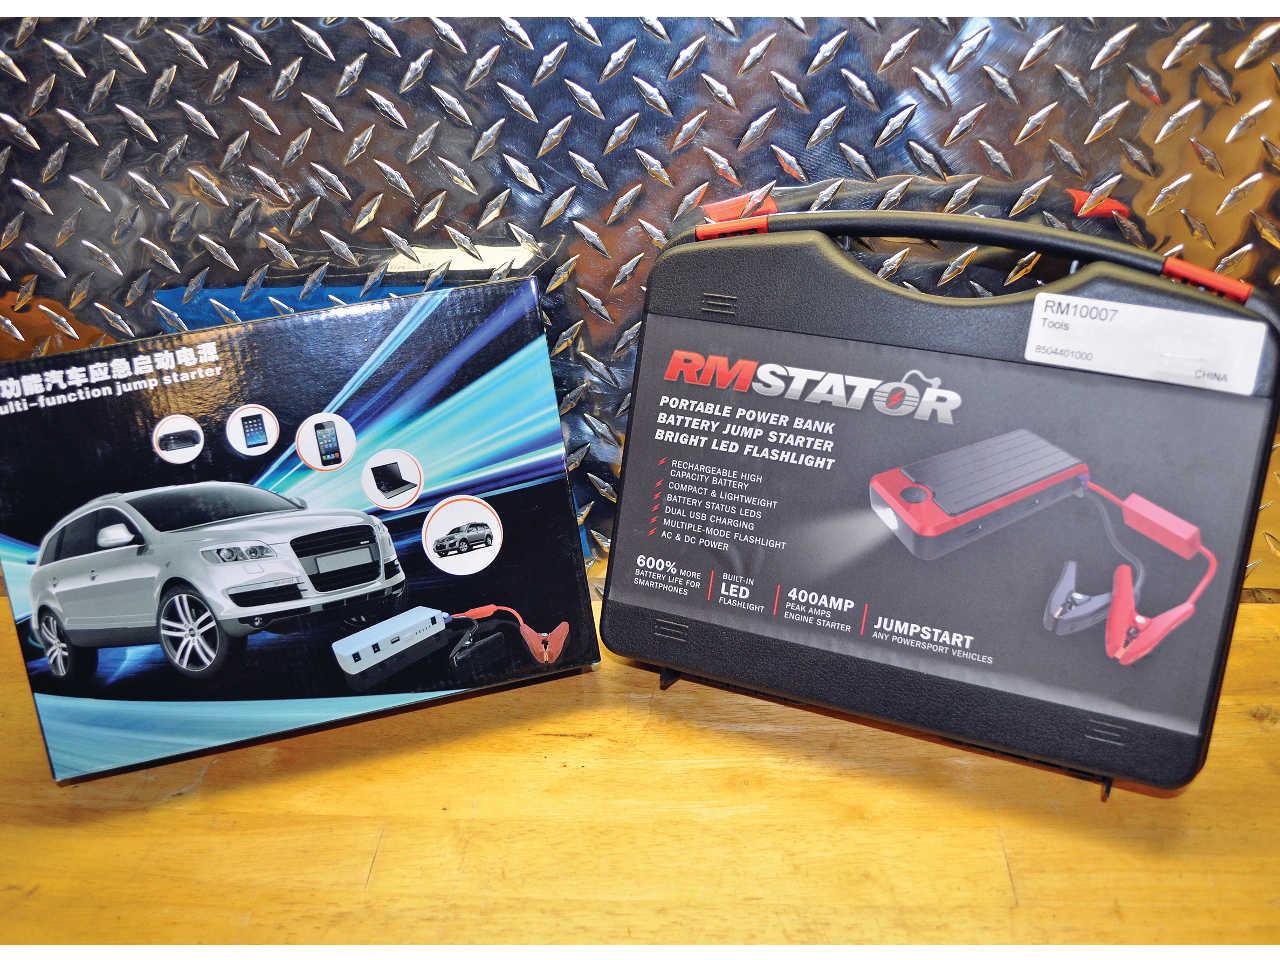 vendor.2014.rm-stator.portable-power-bank.kit_.JPG